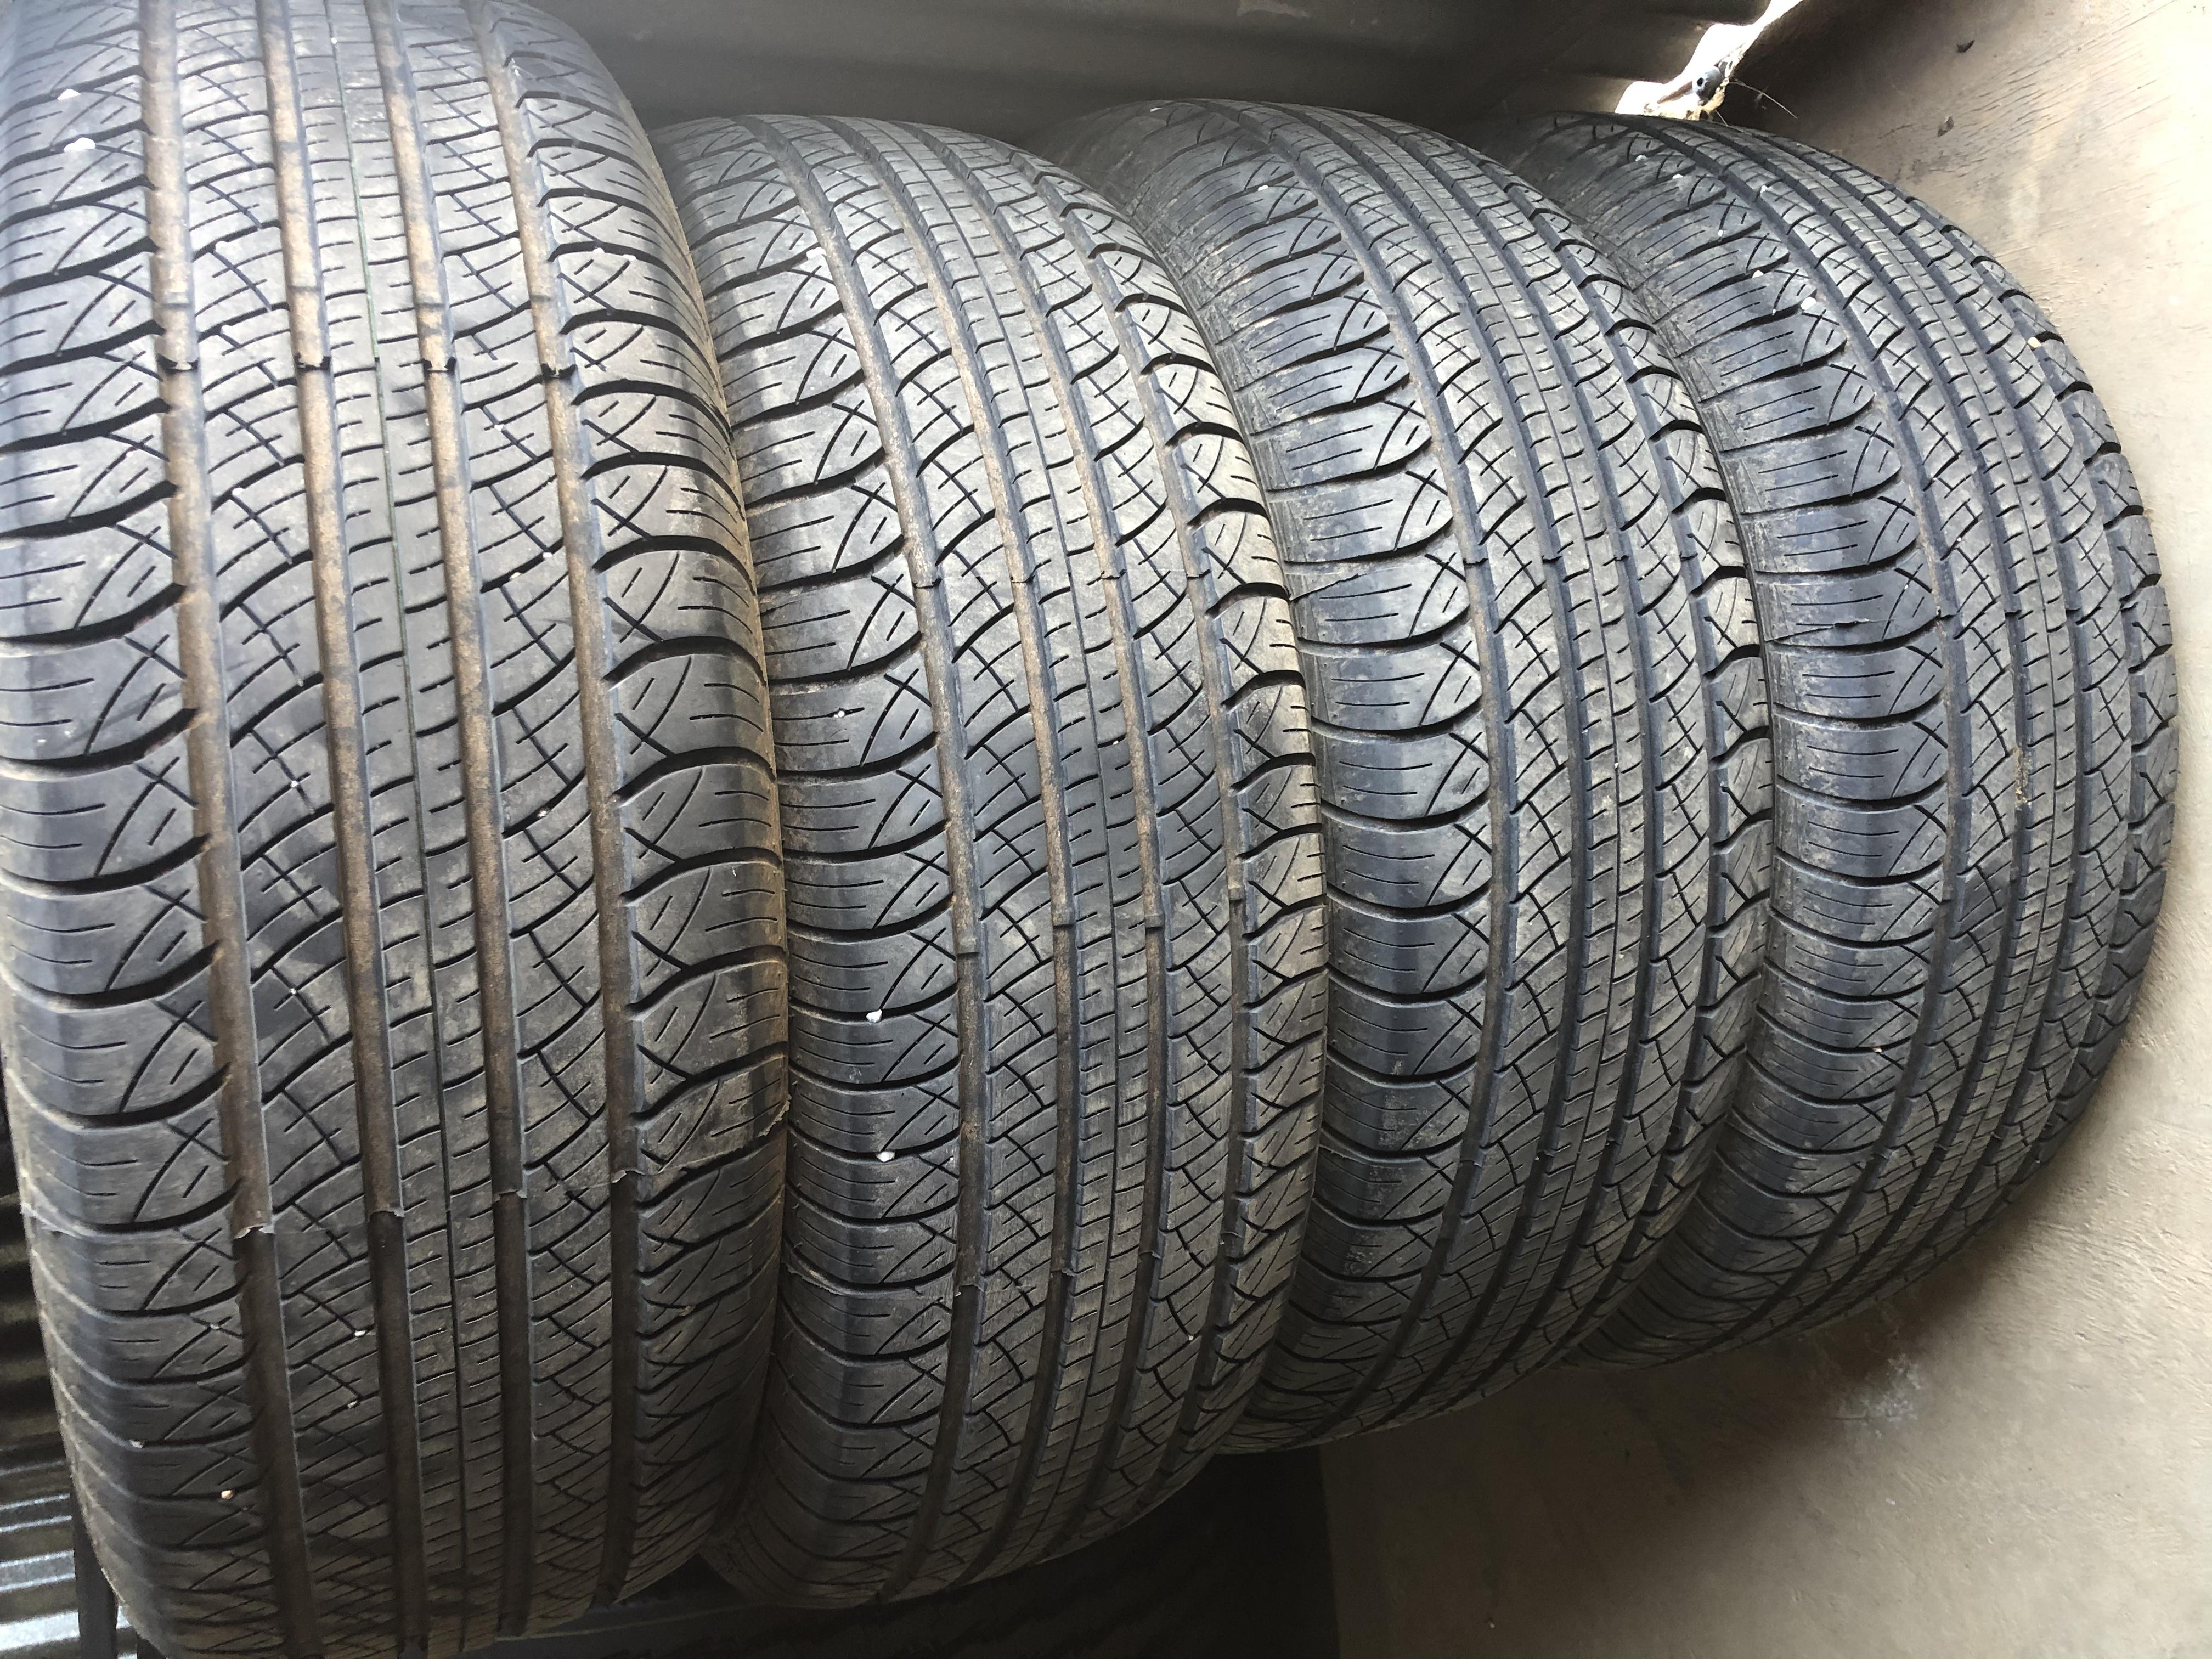 3 x 265/70R17 Lanvigator Performax tyres 80%